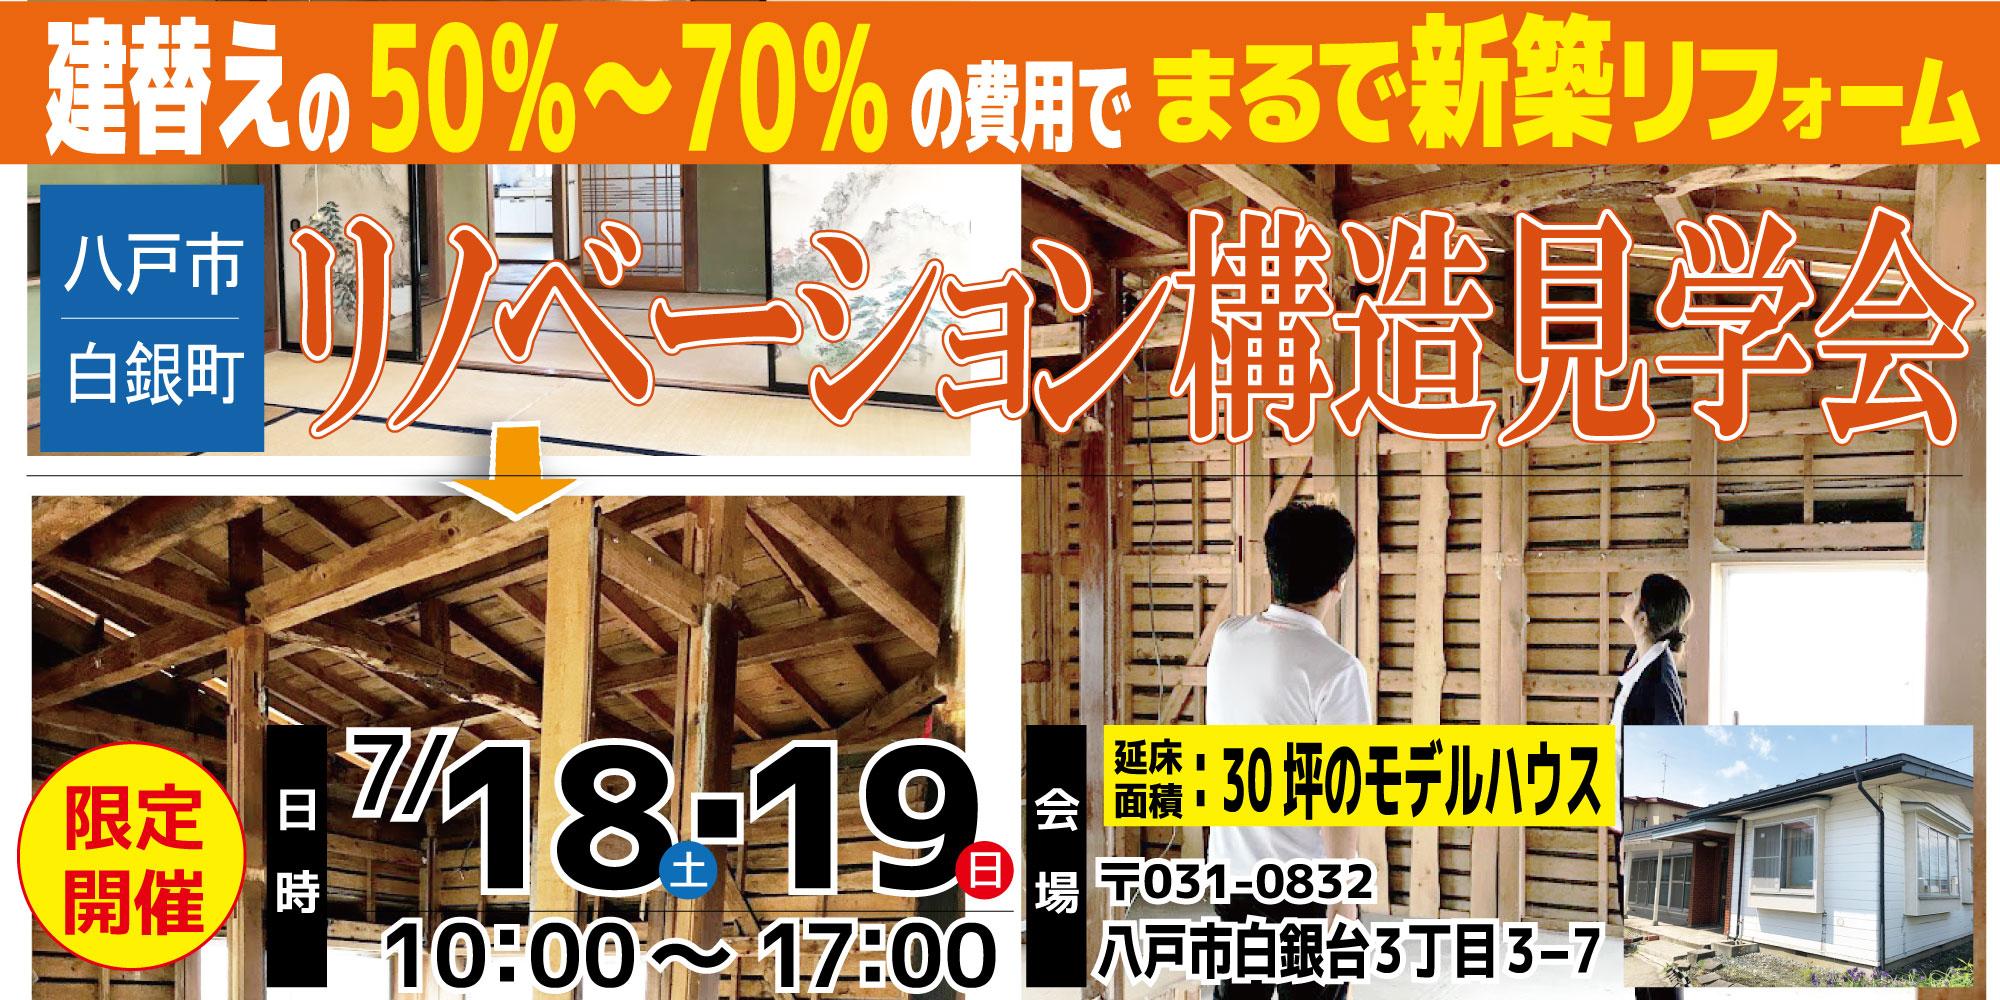 八戸市白銀町リノベーション構造見学会 7月18日・19日 限定開催決定!!